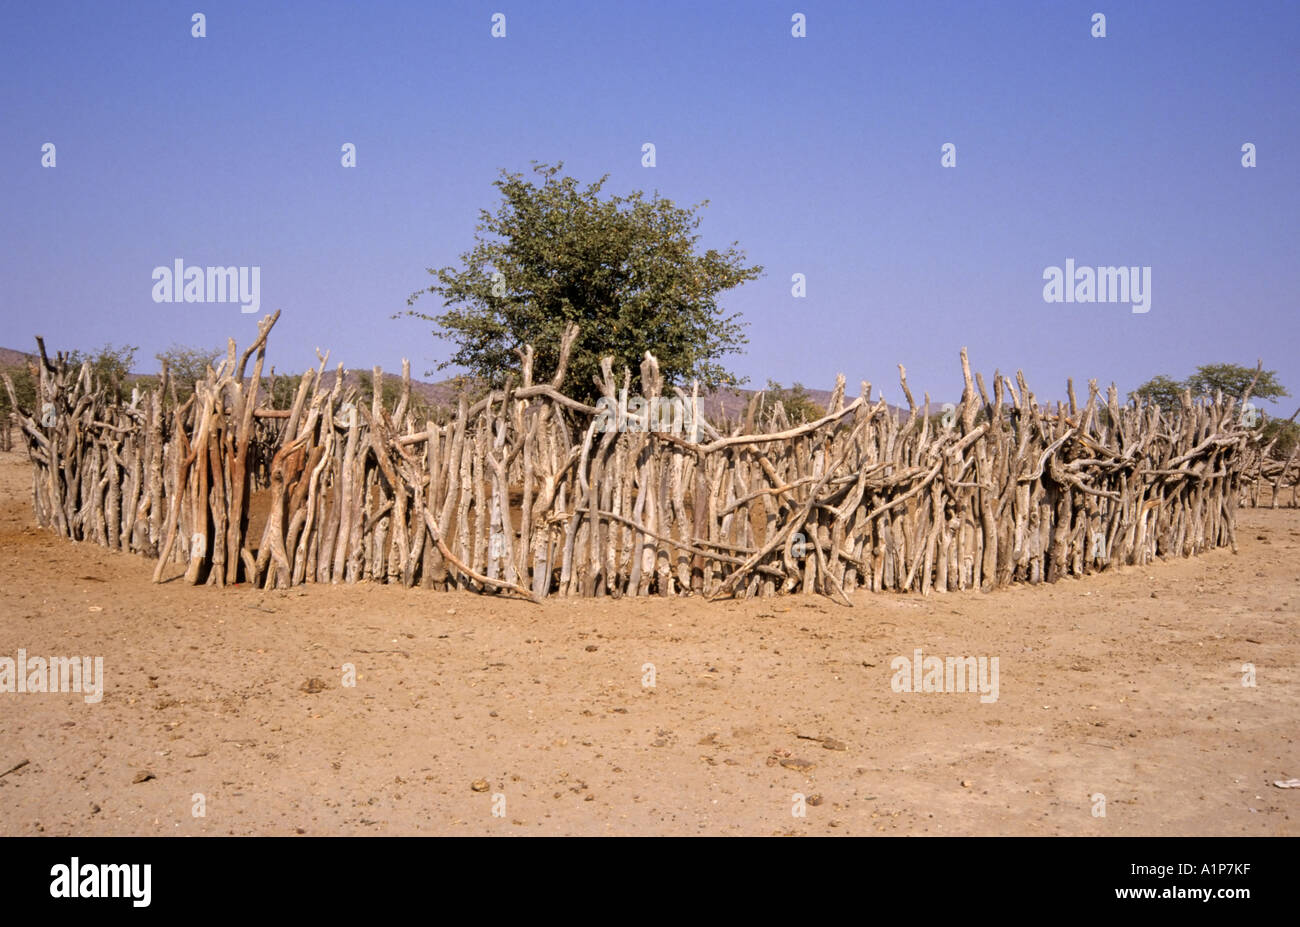 Animal stockade, Himba village, Namibia - Stock Image